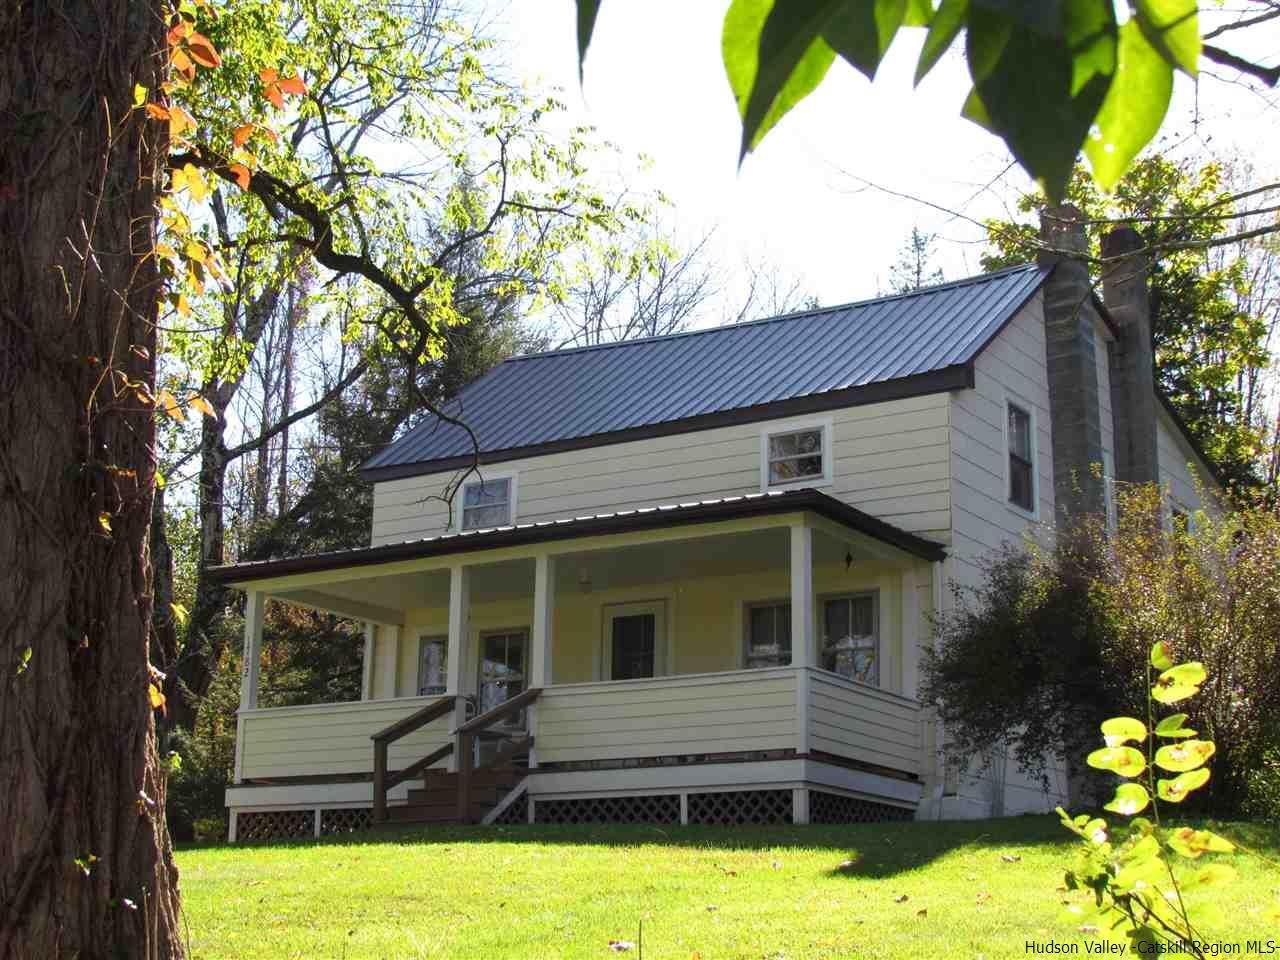 Single Family Home for Sale at 1782 Berme Road 1782 Berme Road Kerhonkson, New York 12446 United States